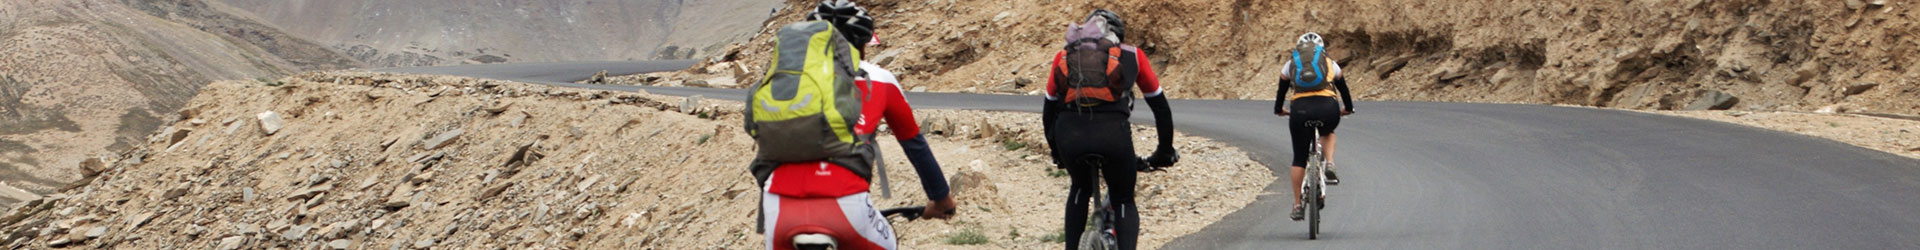 3 loaded bike riders cycling on-road tarmac